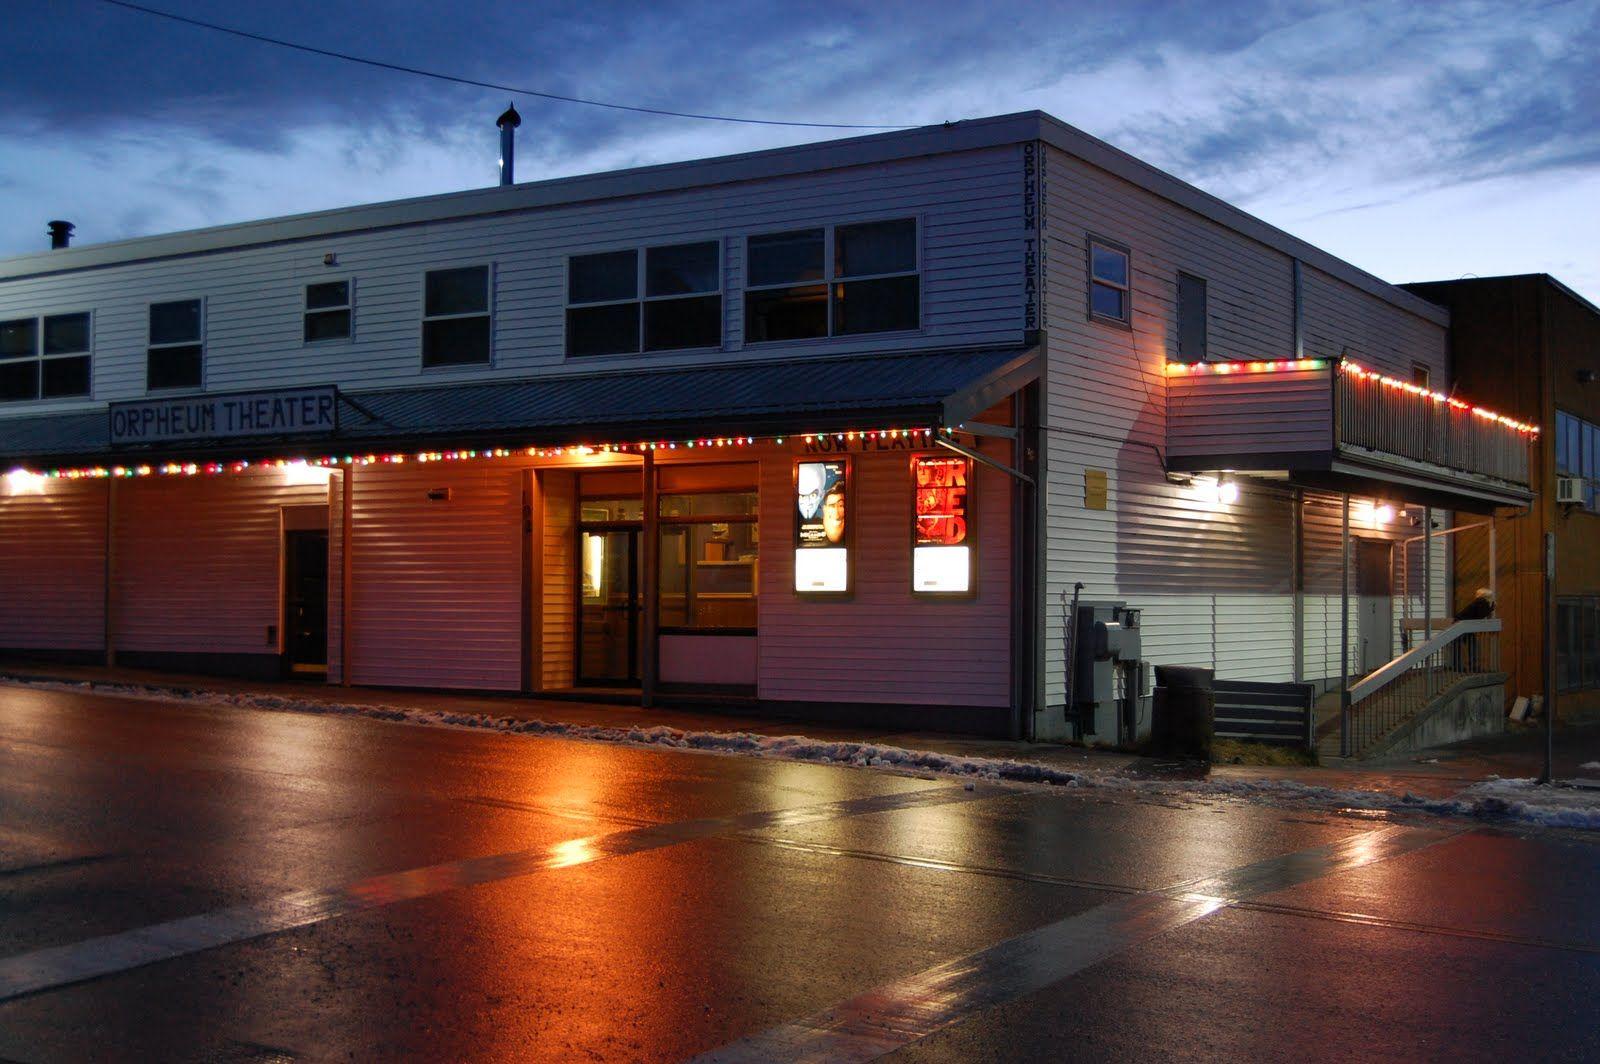 Orpheum Theater Kodiak House Styles City Landscape Mansions